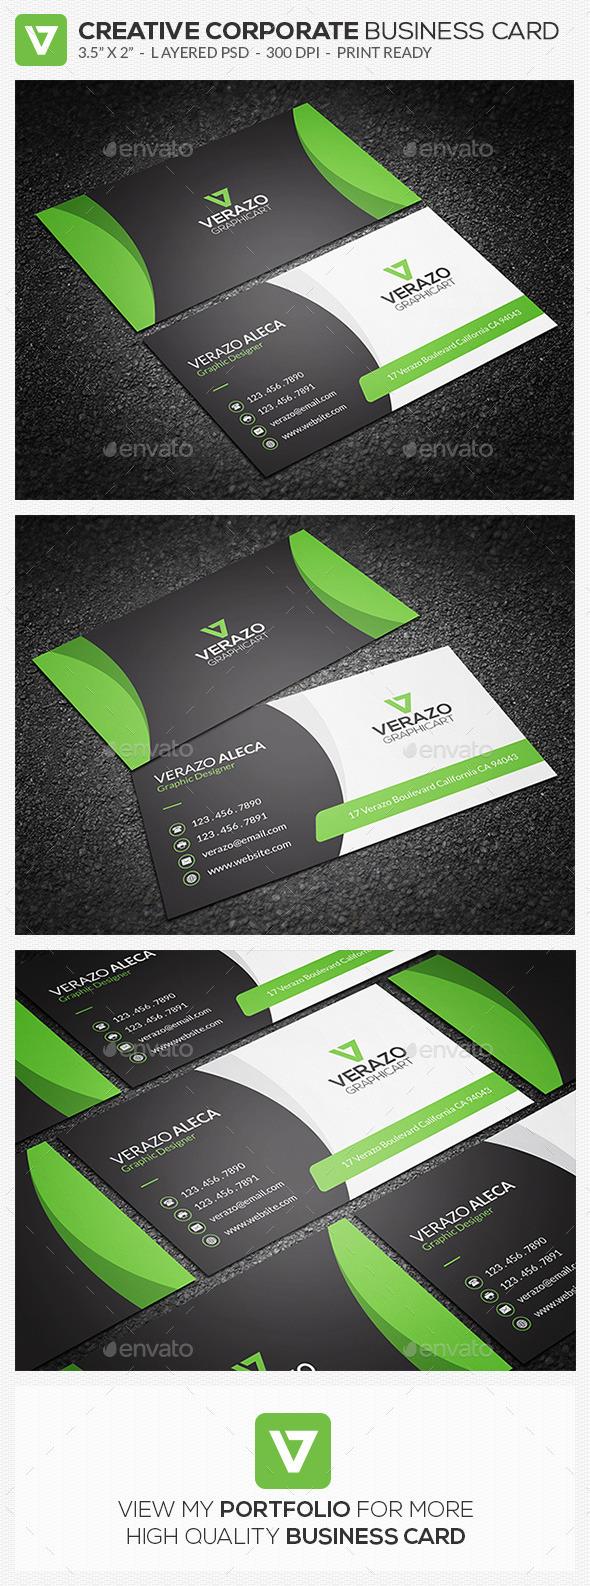 Creative Corporate Business Card 75 - Corporate Business Cards